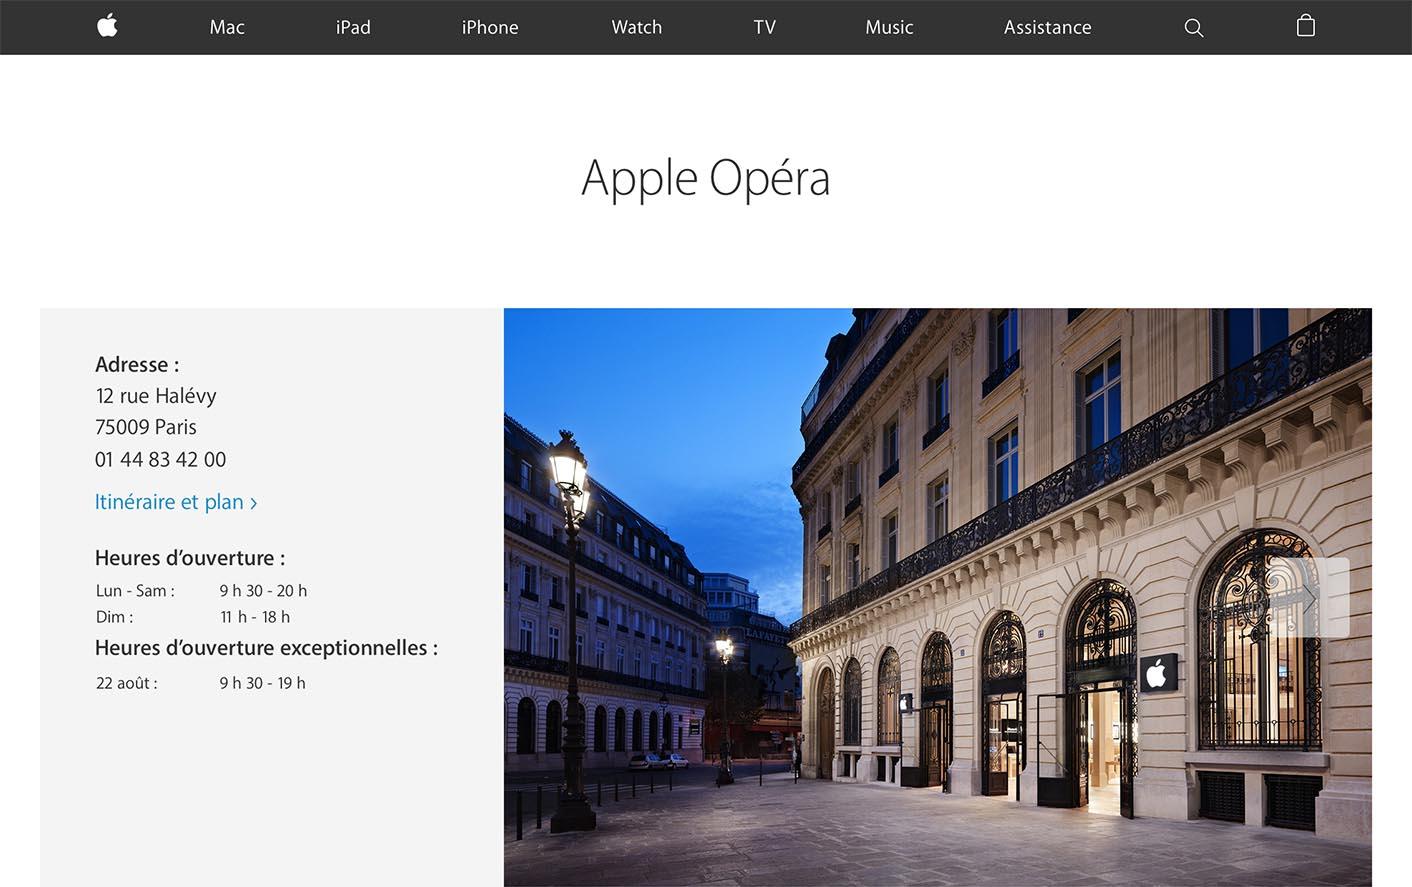 Apple Opera